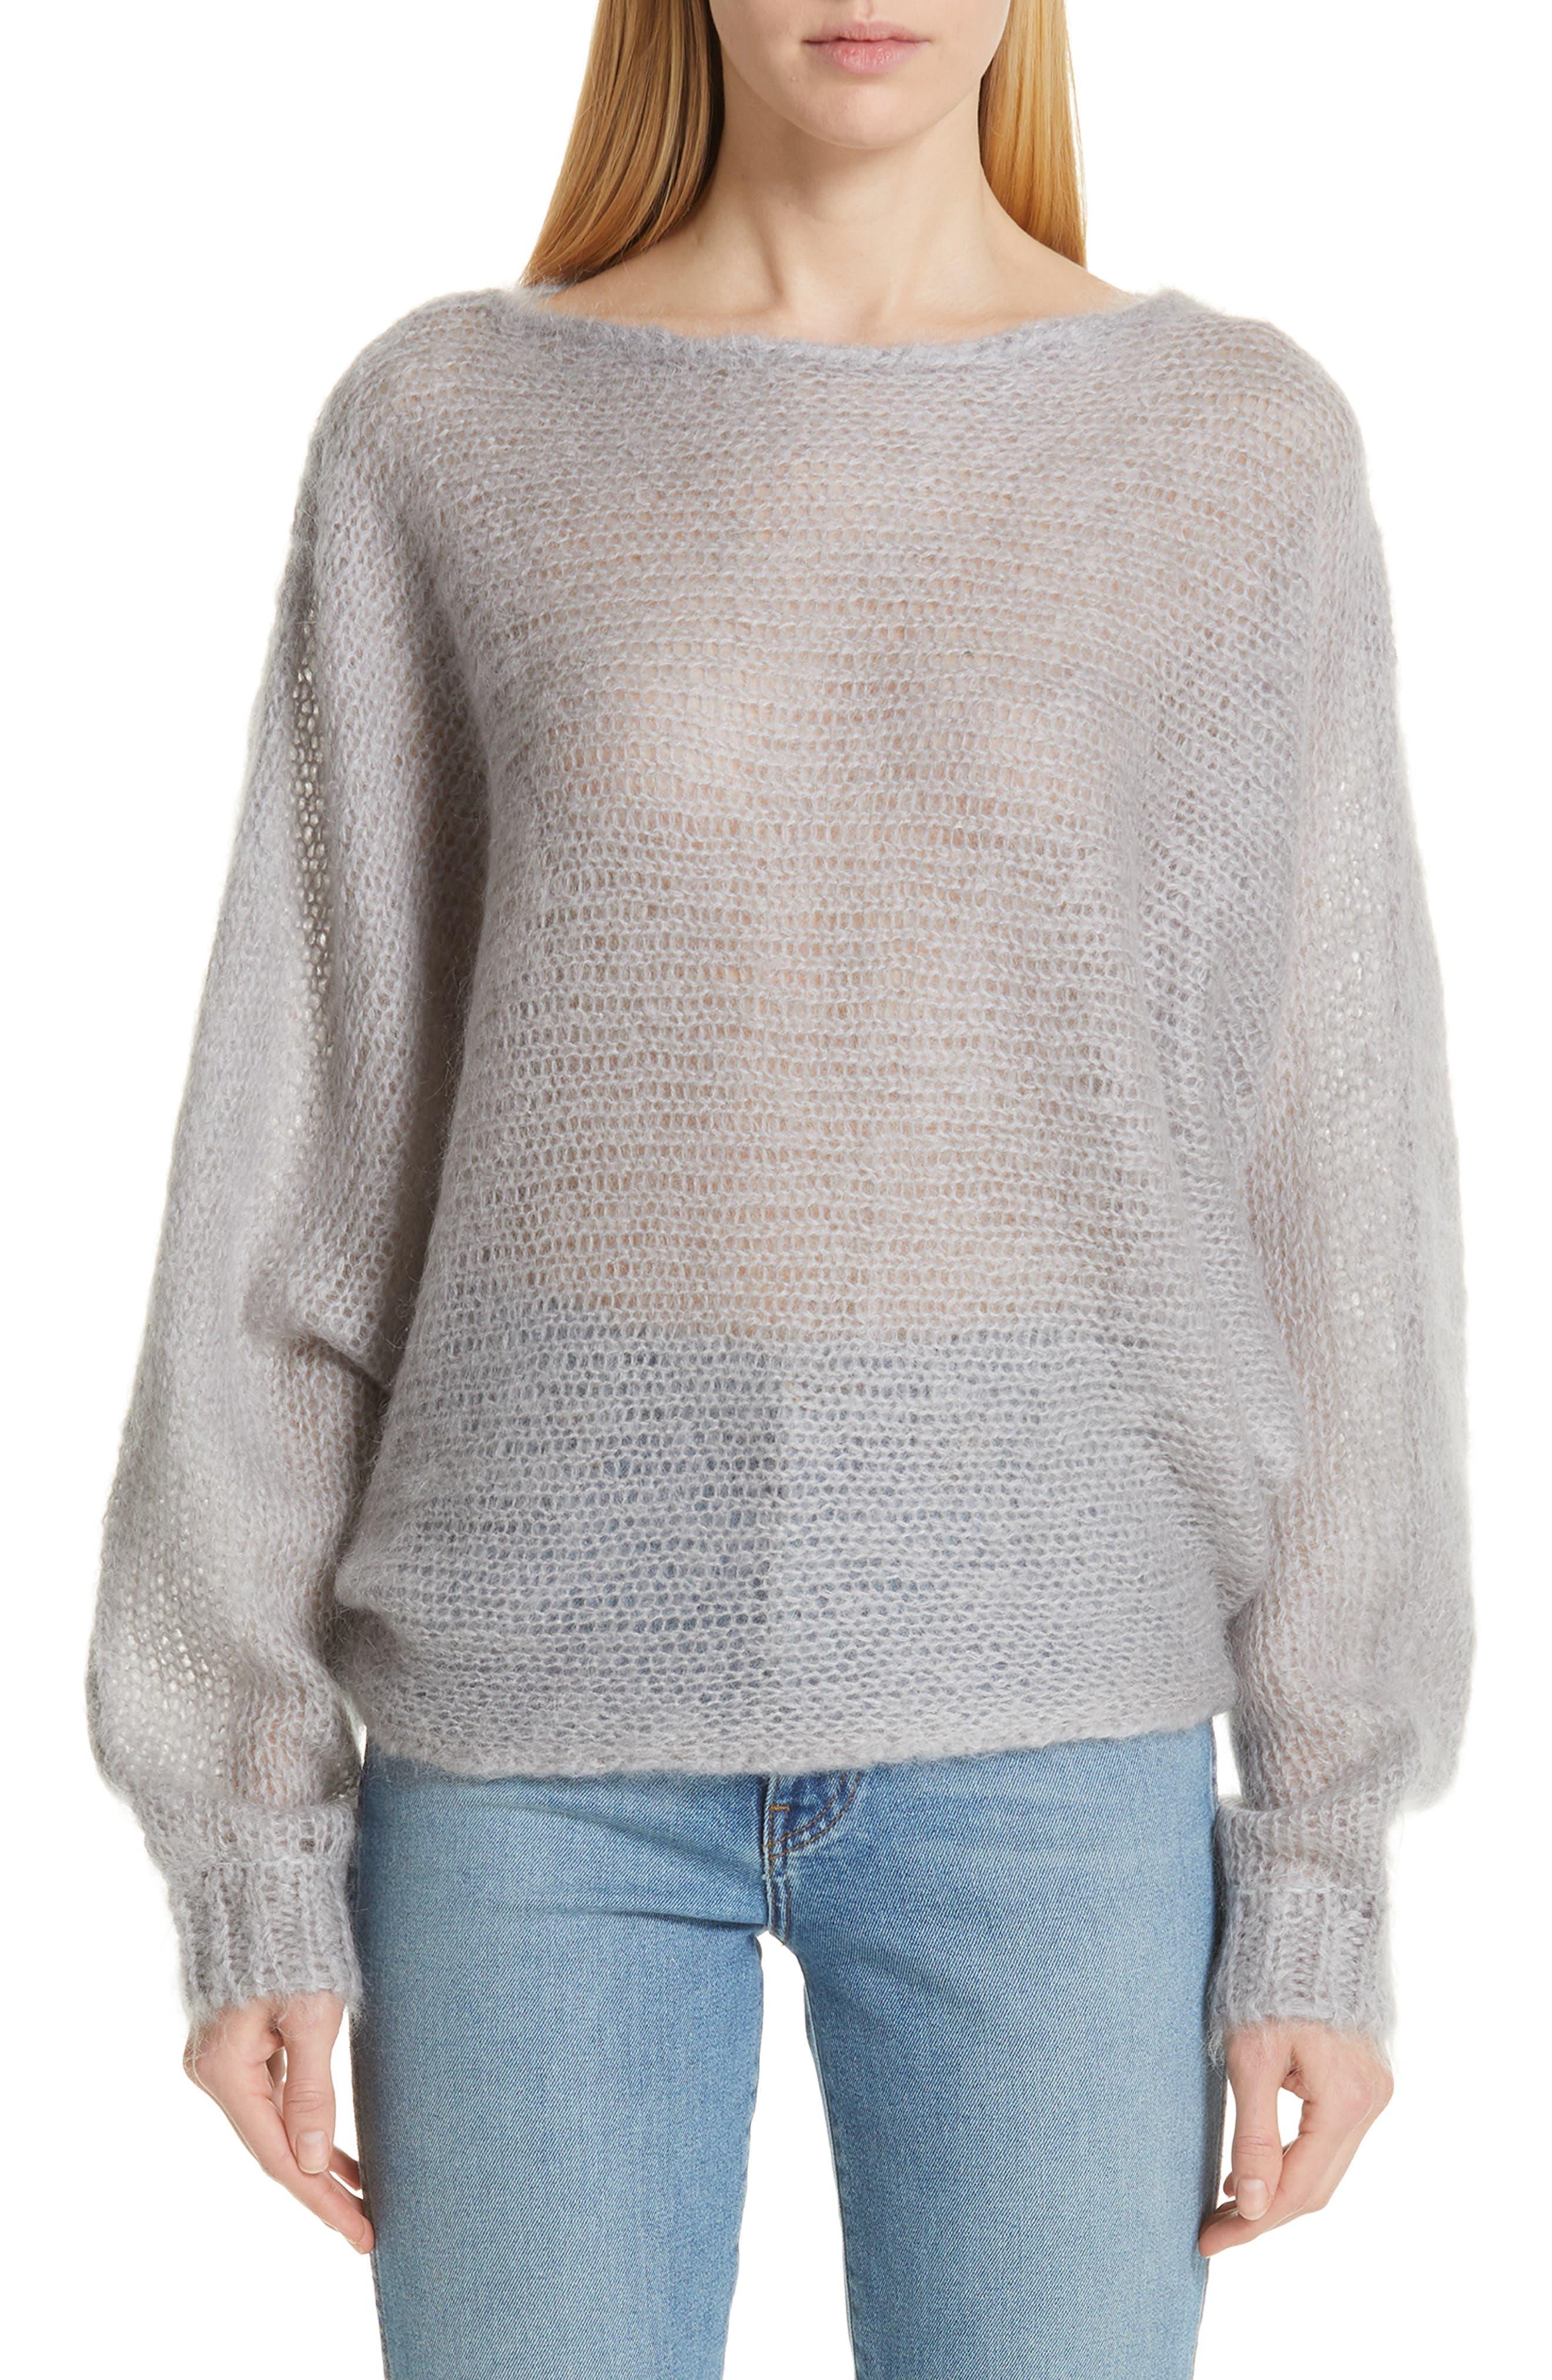 Simon Miller Fay Mohair & Wool Sweater, Grey